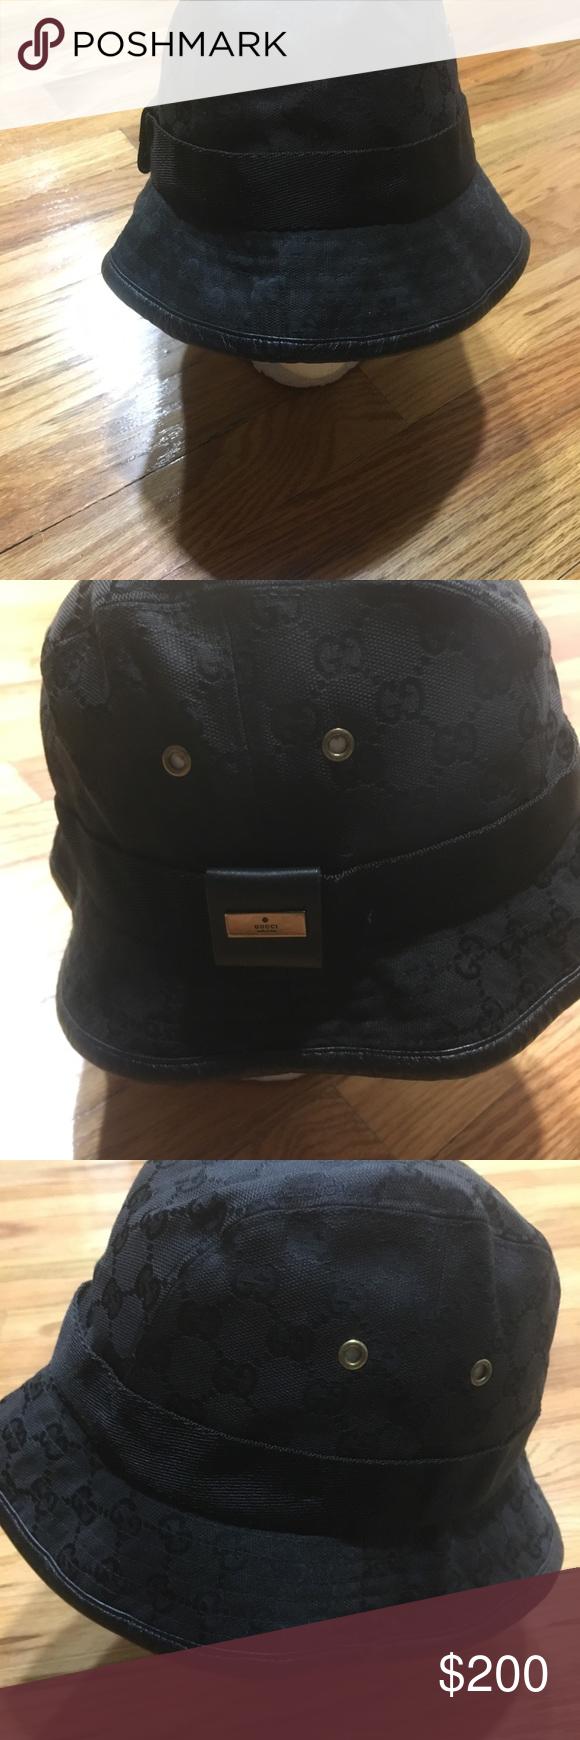 8b70faacfb7 Gucci bucket hat Gucci bucket hat Gucci Accessories Hats